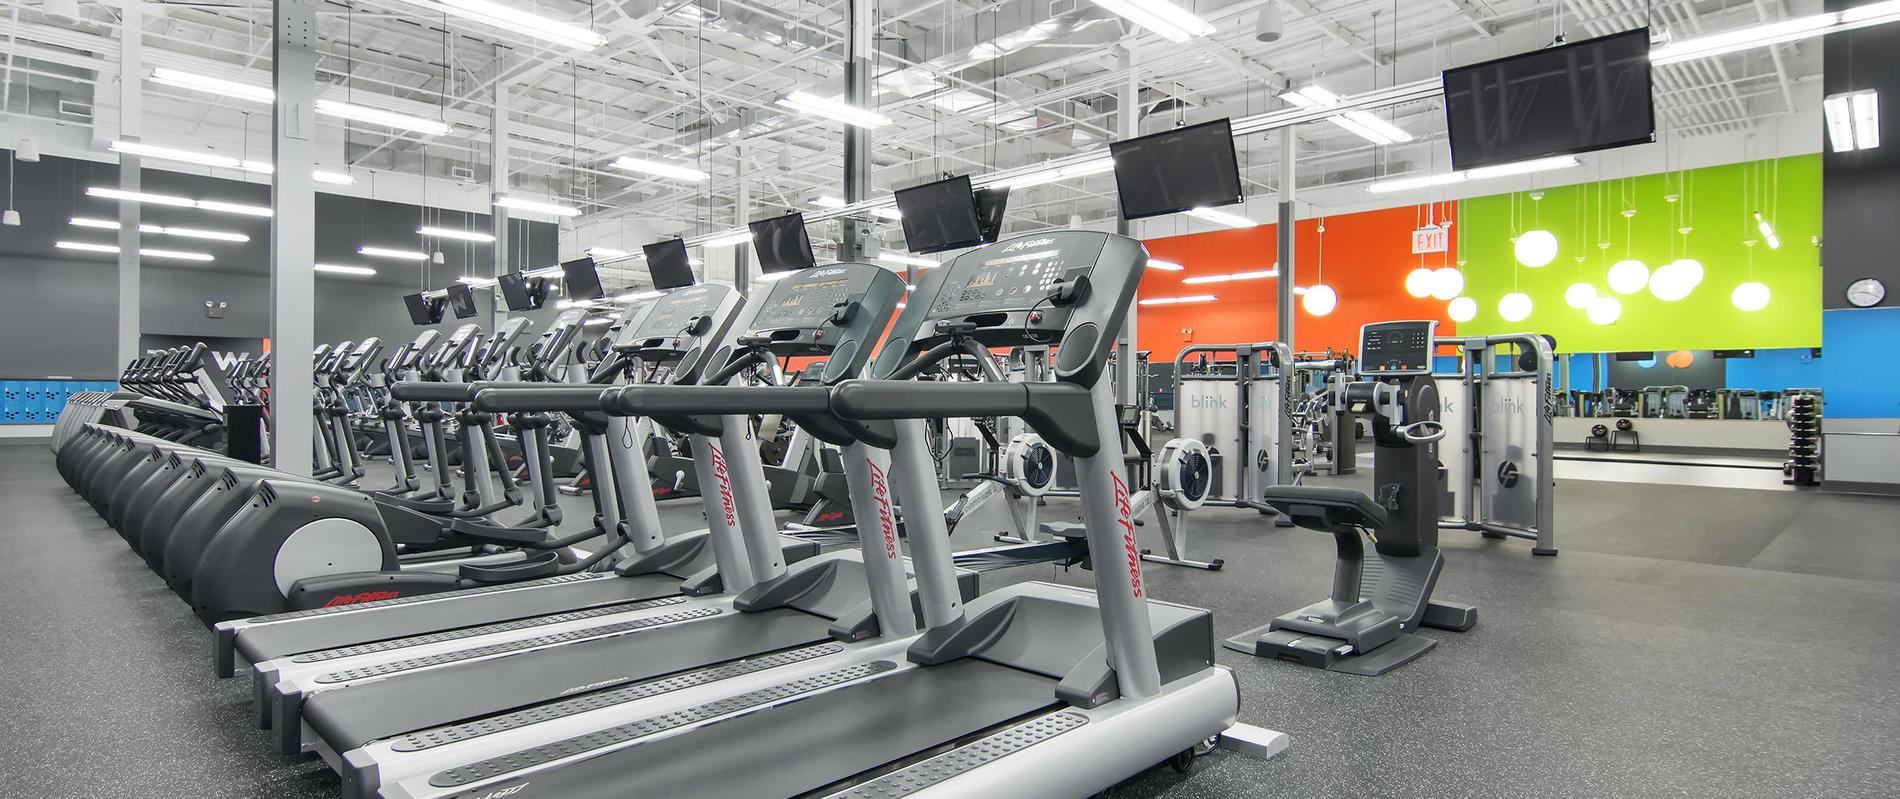 All Blink Fitness Gyms in NJ   cardio equipment, strength ...